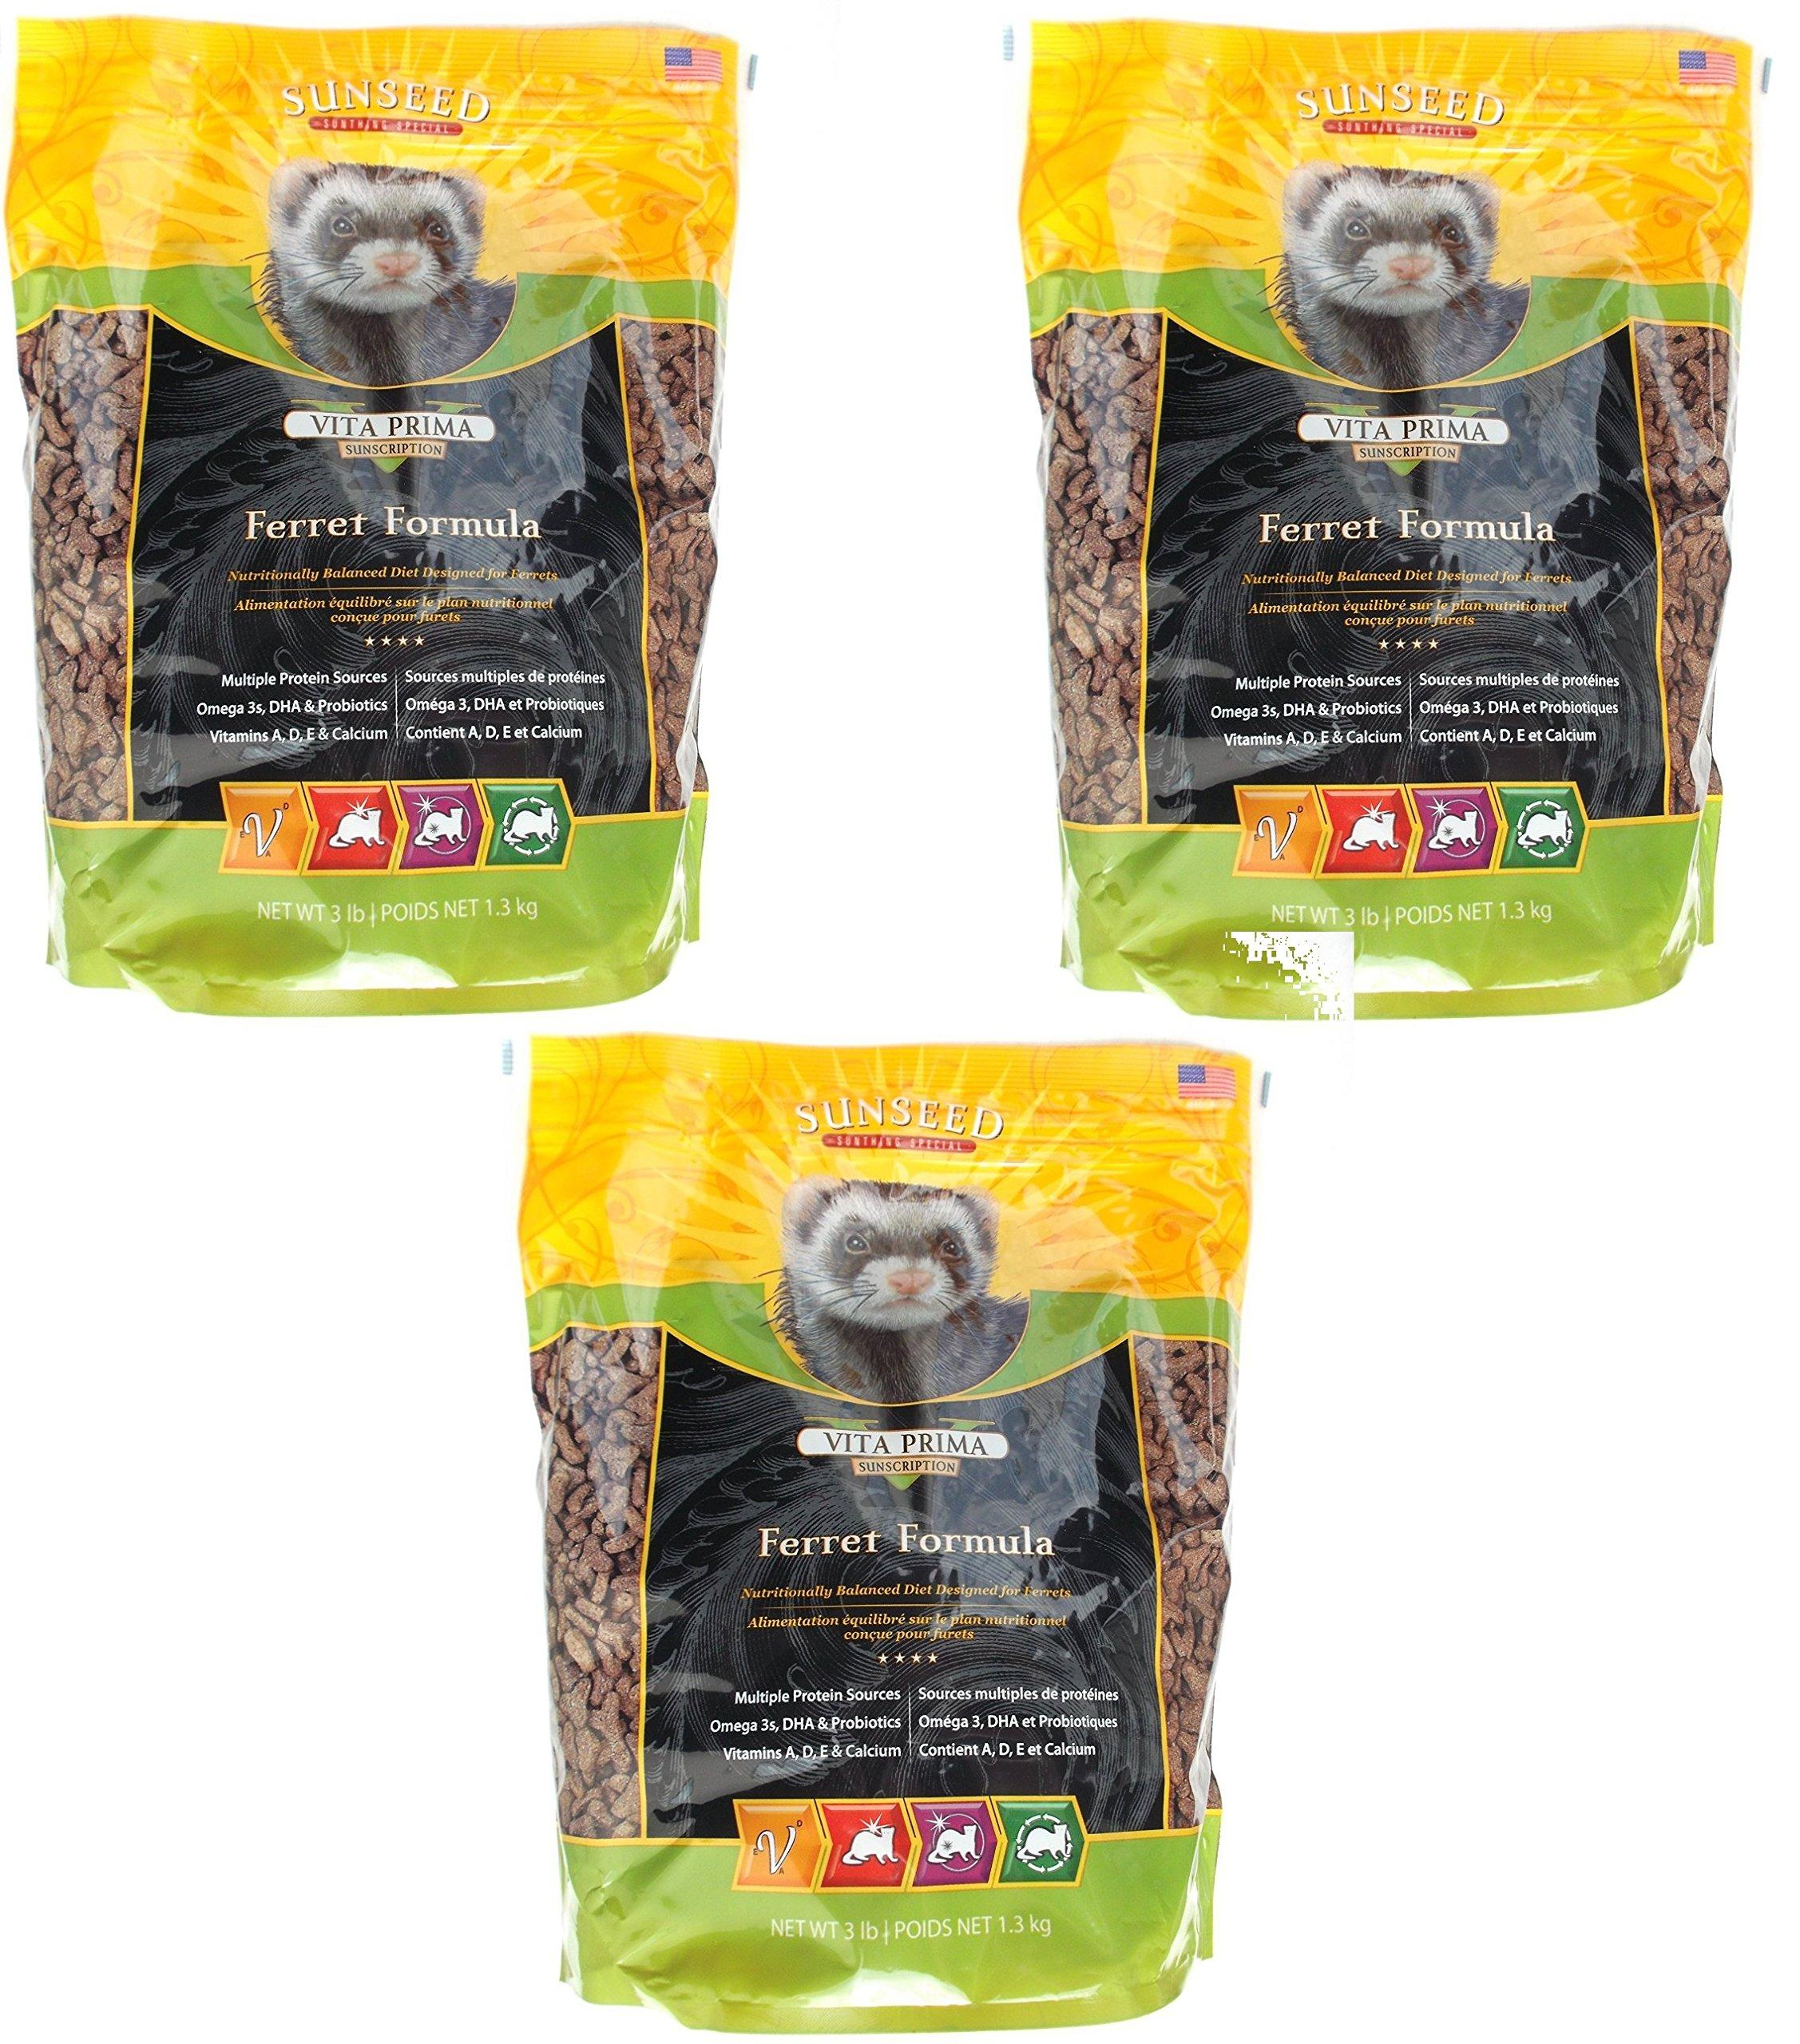 Sunseed Sunscription Vita Prima Ferret Formula, 3-Pound Bag (3 Pack)